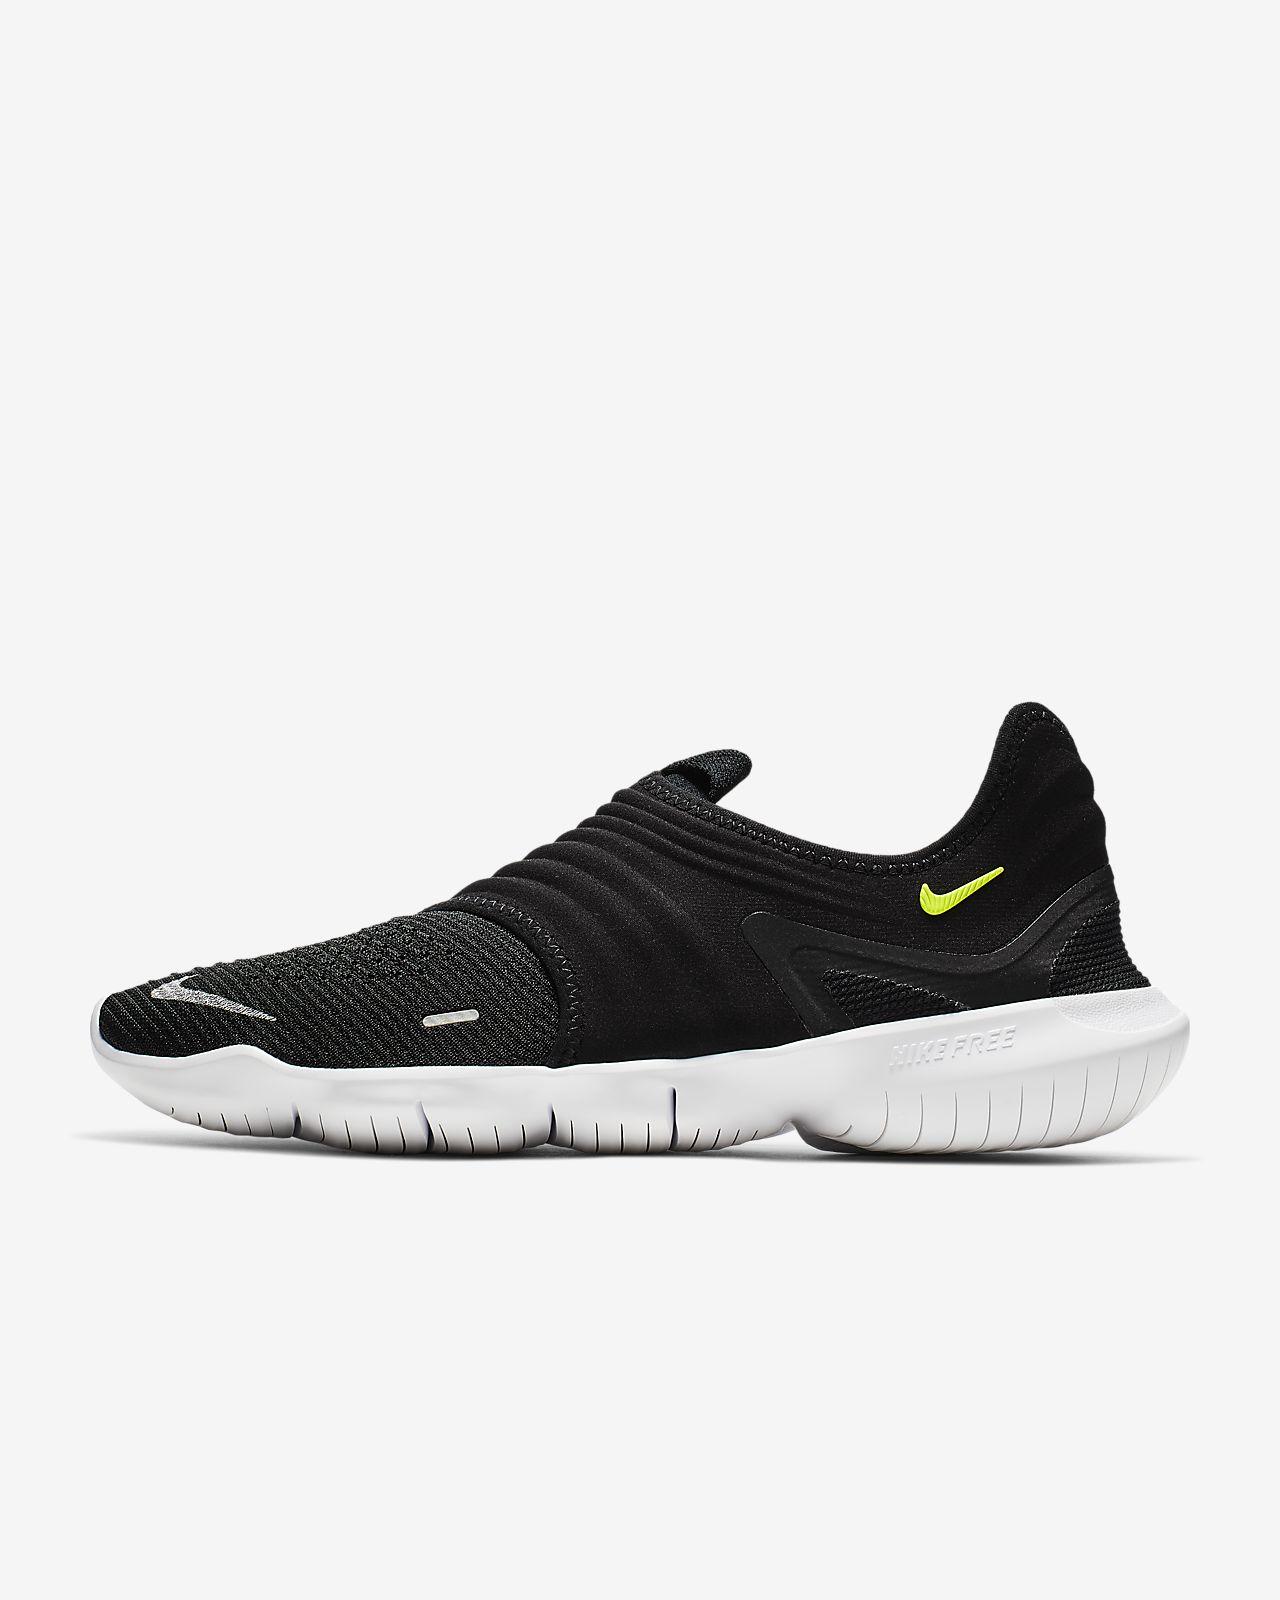 1287a6a75 Nike Free RN Flyknit 3.0 Herren-Laufschuh. Nike.com CH